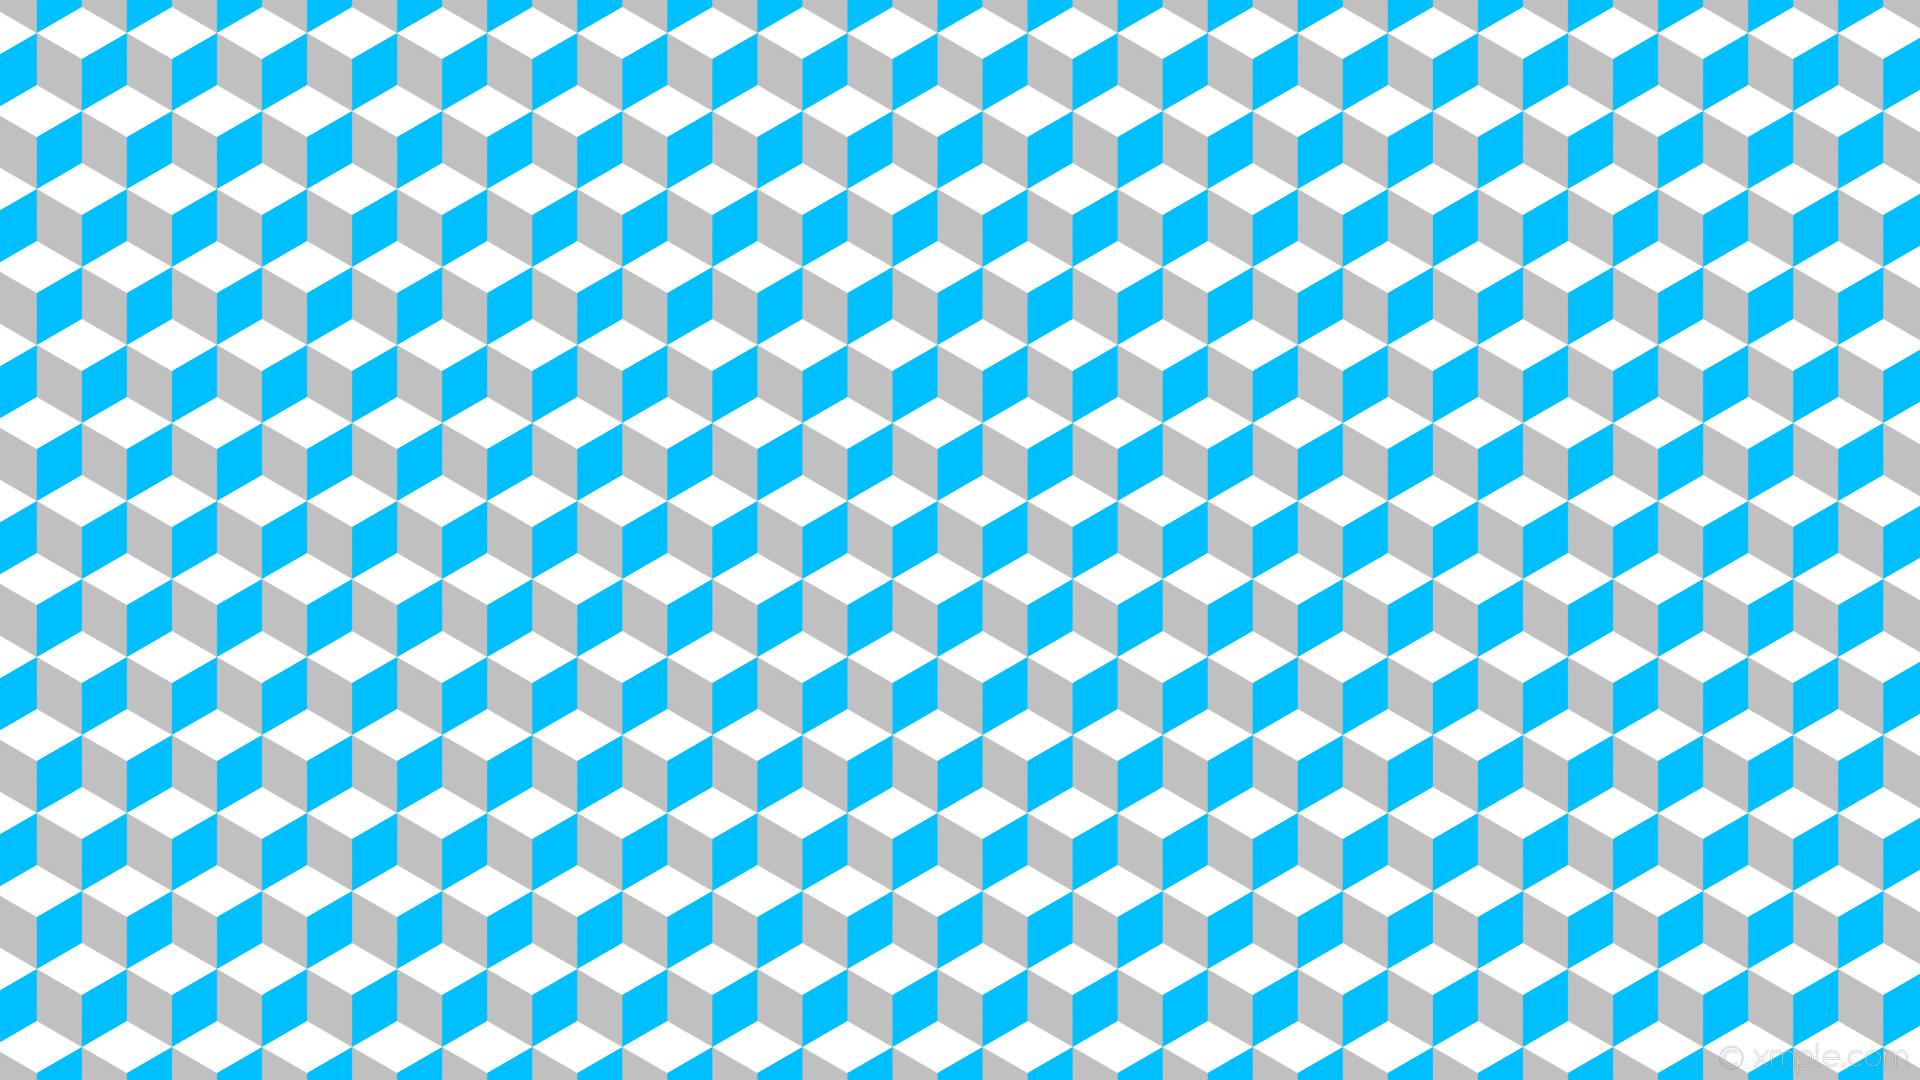 wallpaper grey 3d cubes white blue silver deep sky blue #c0c0c0 #00bfff  #ffffff